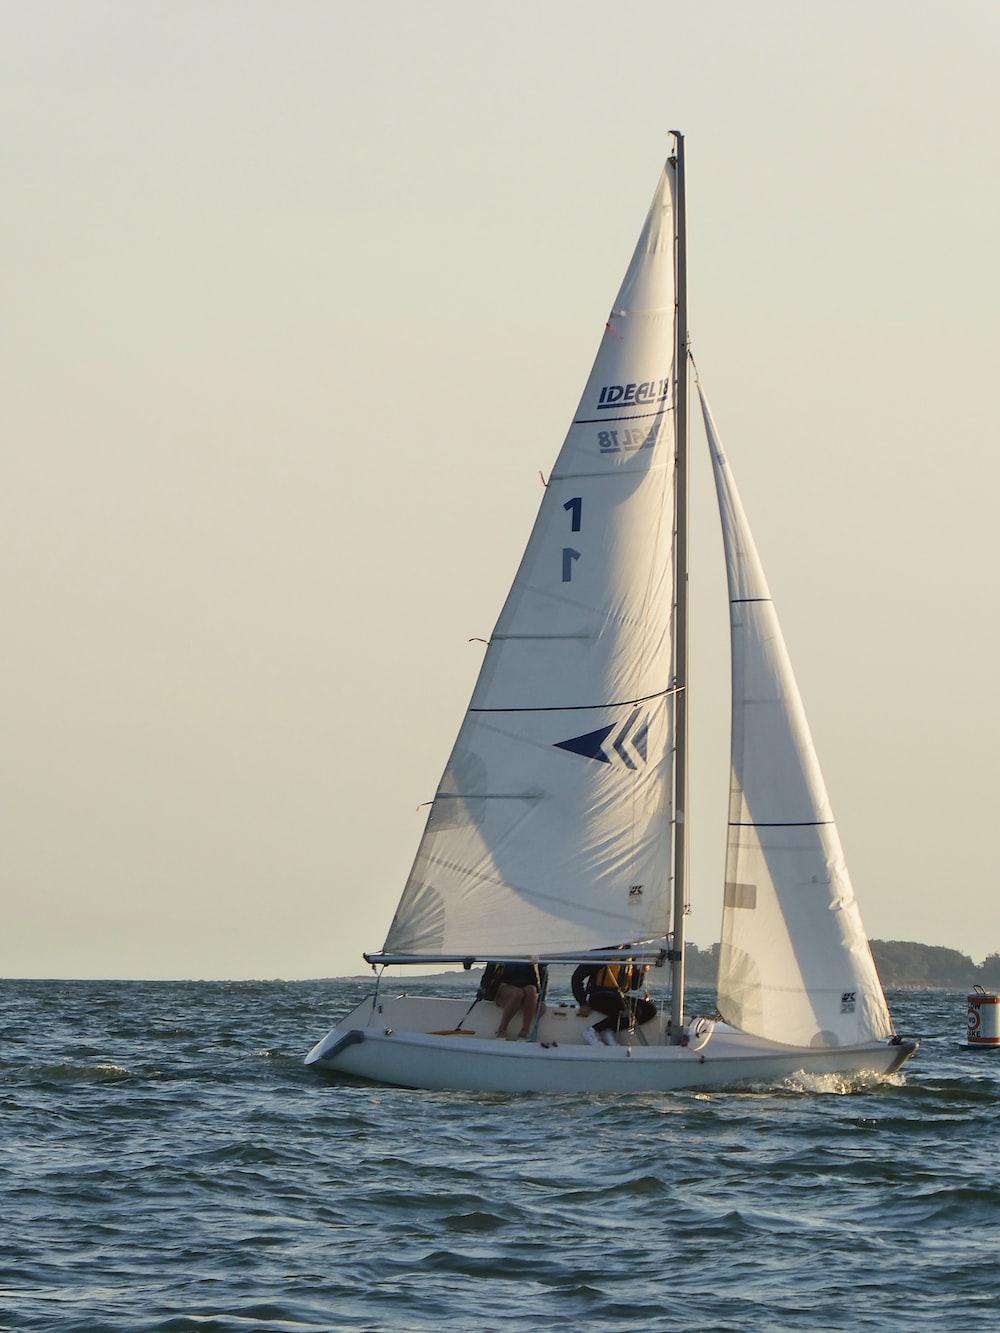 white sail boat on sea during daytime